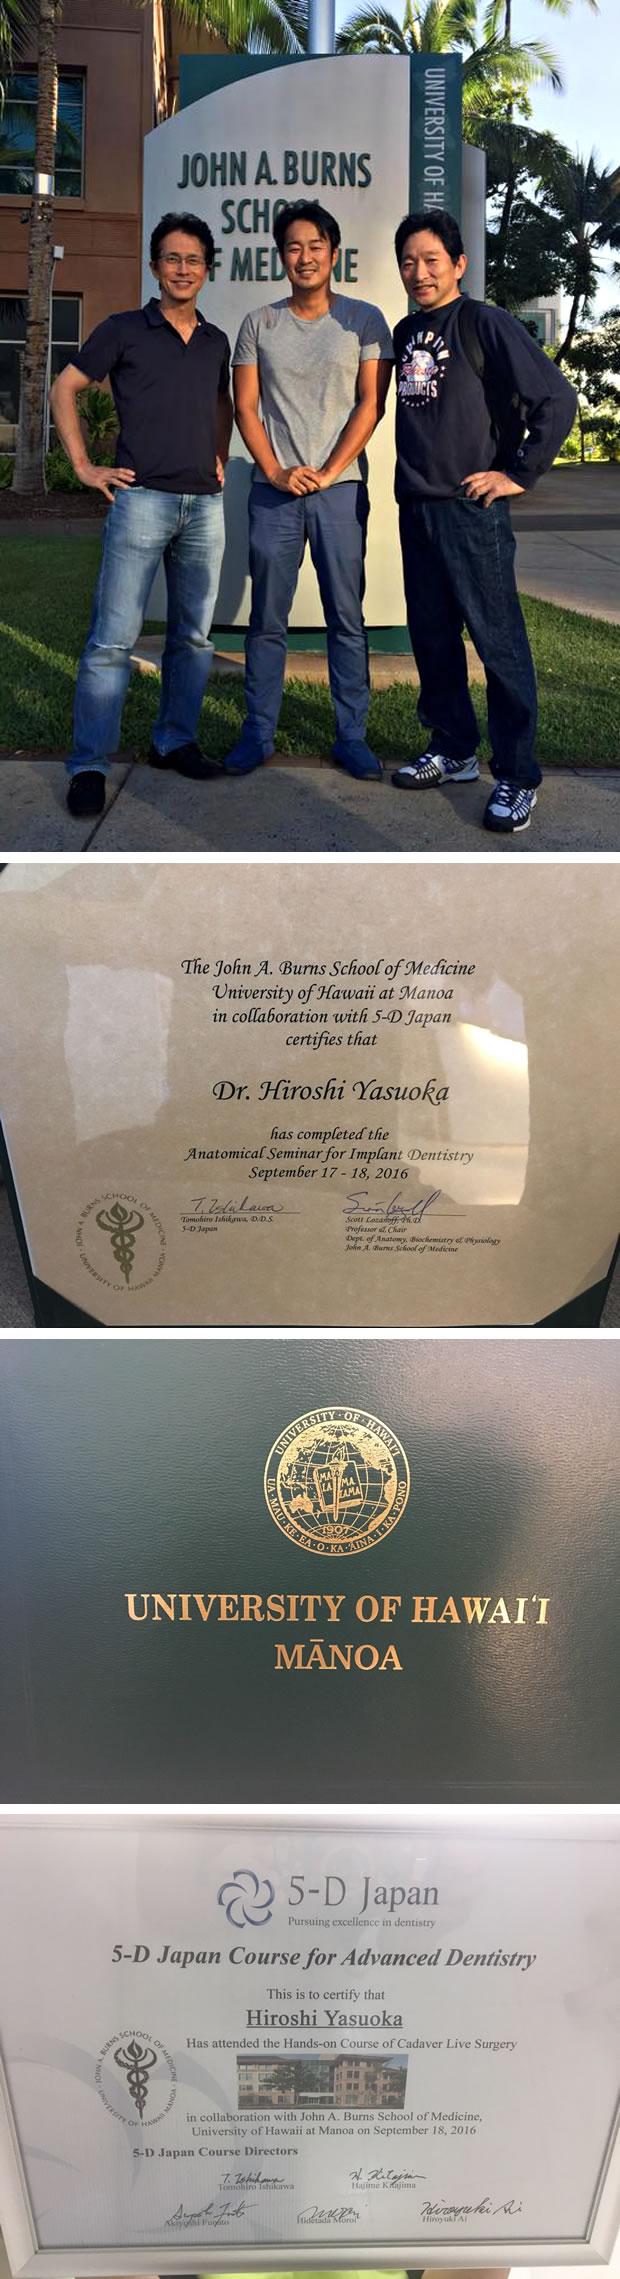 5D ハワイ大学医学部カダバー実習、医学部卒後研修としての解剖学